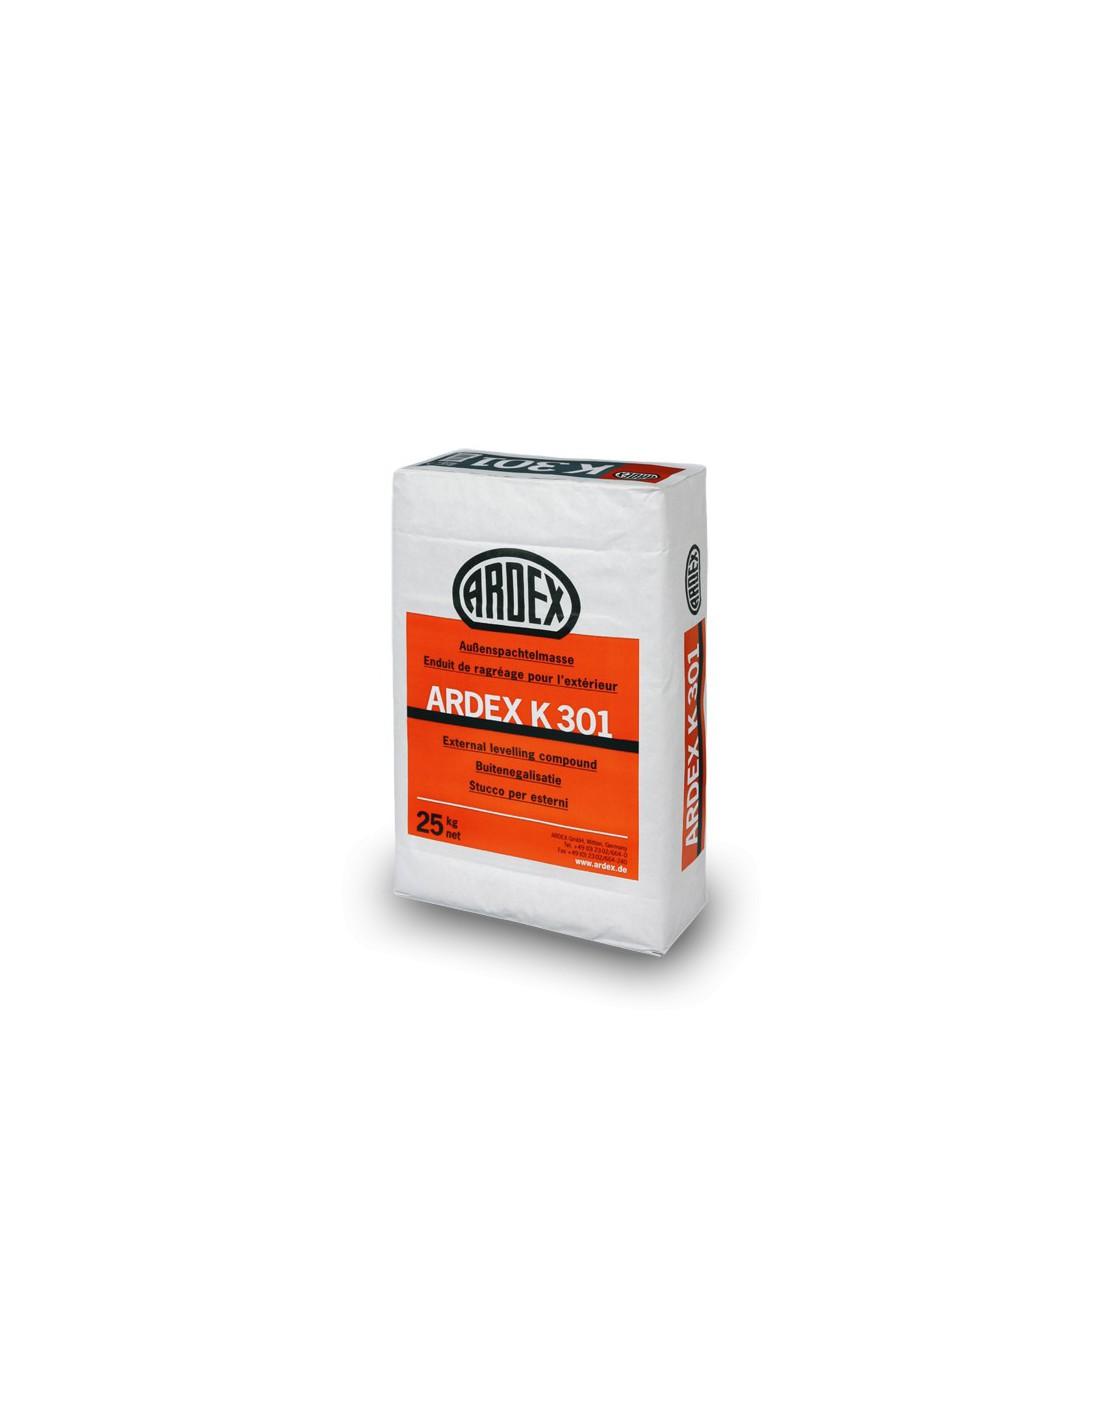 Mortero autonivelante especial para exteriores ardex k301 for Pasta autonivelante precio